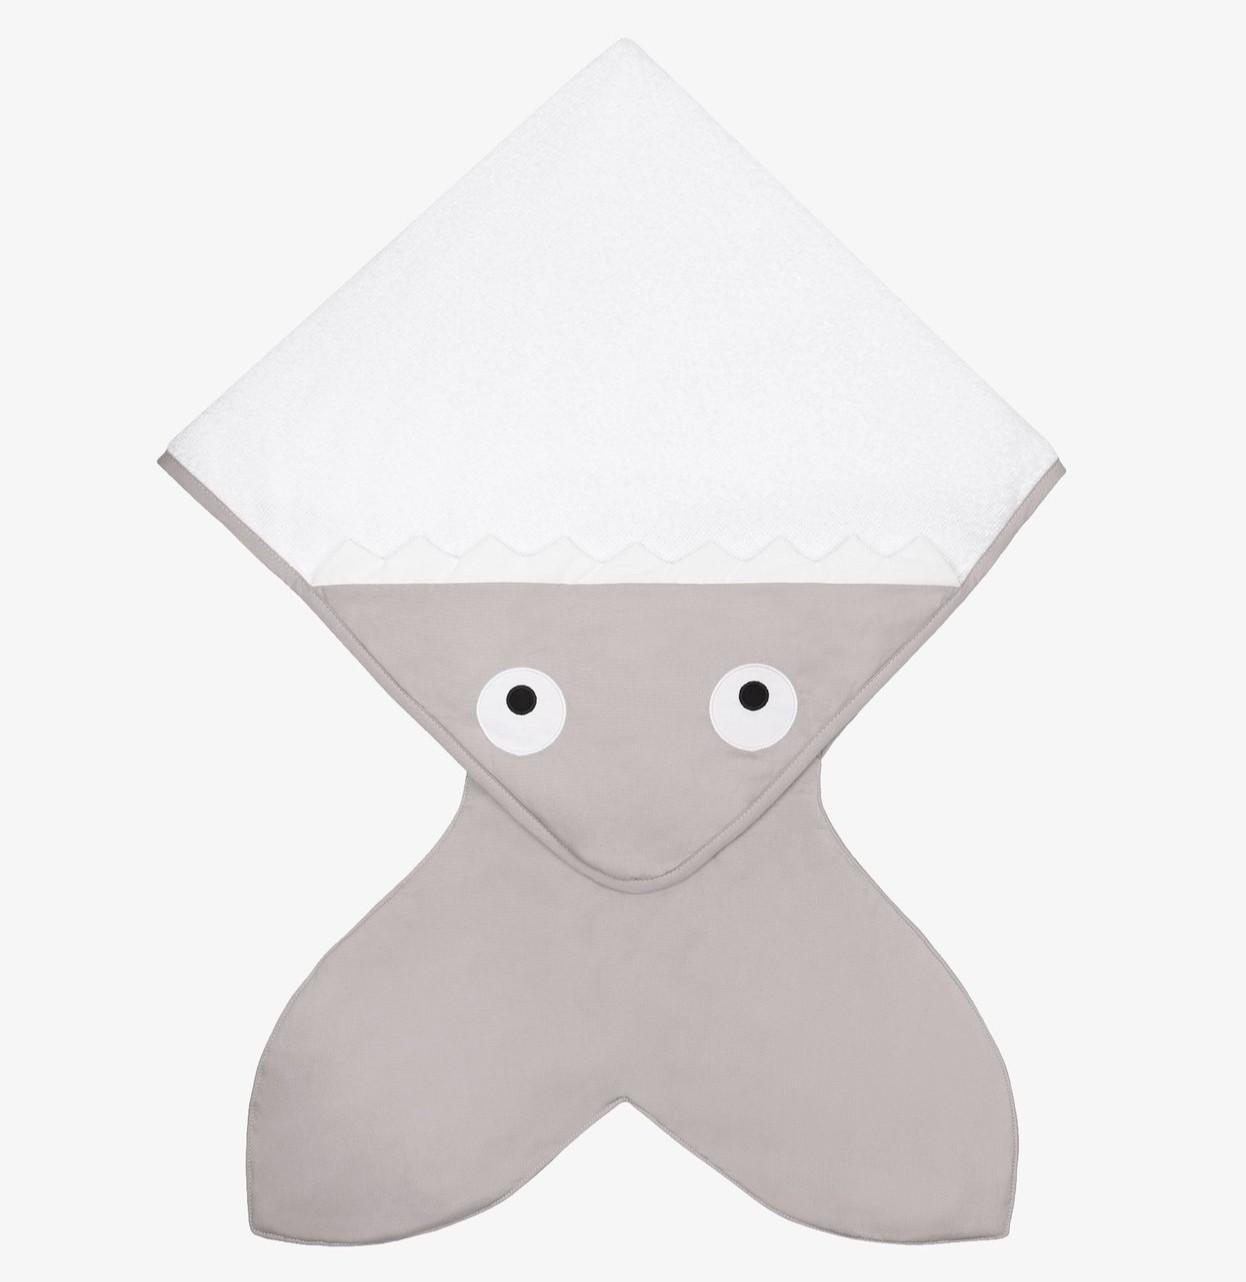 Baby Bites - Handdoek 75X75cm - Stone